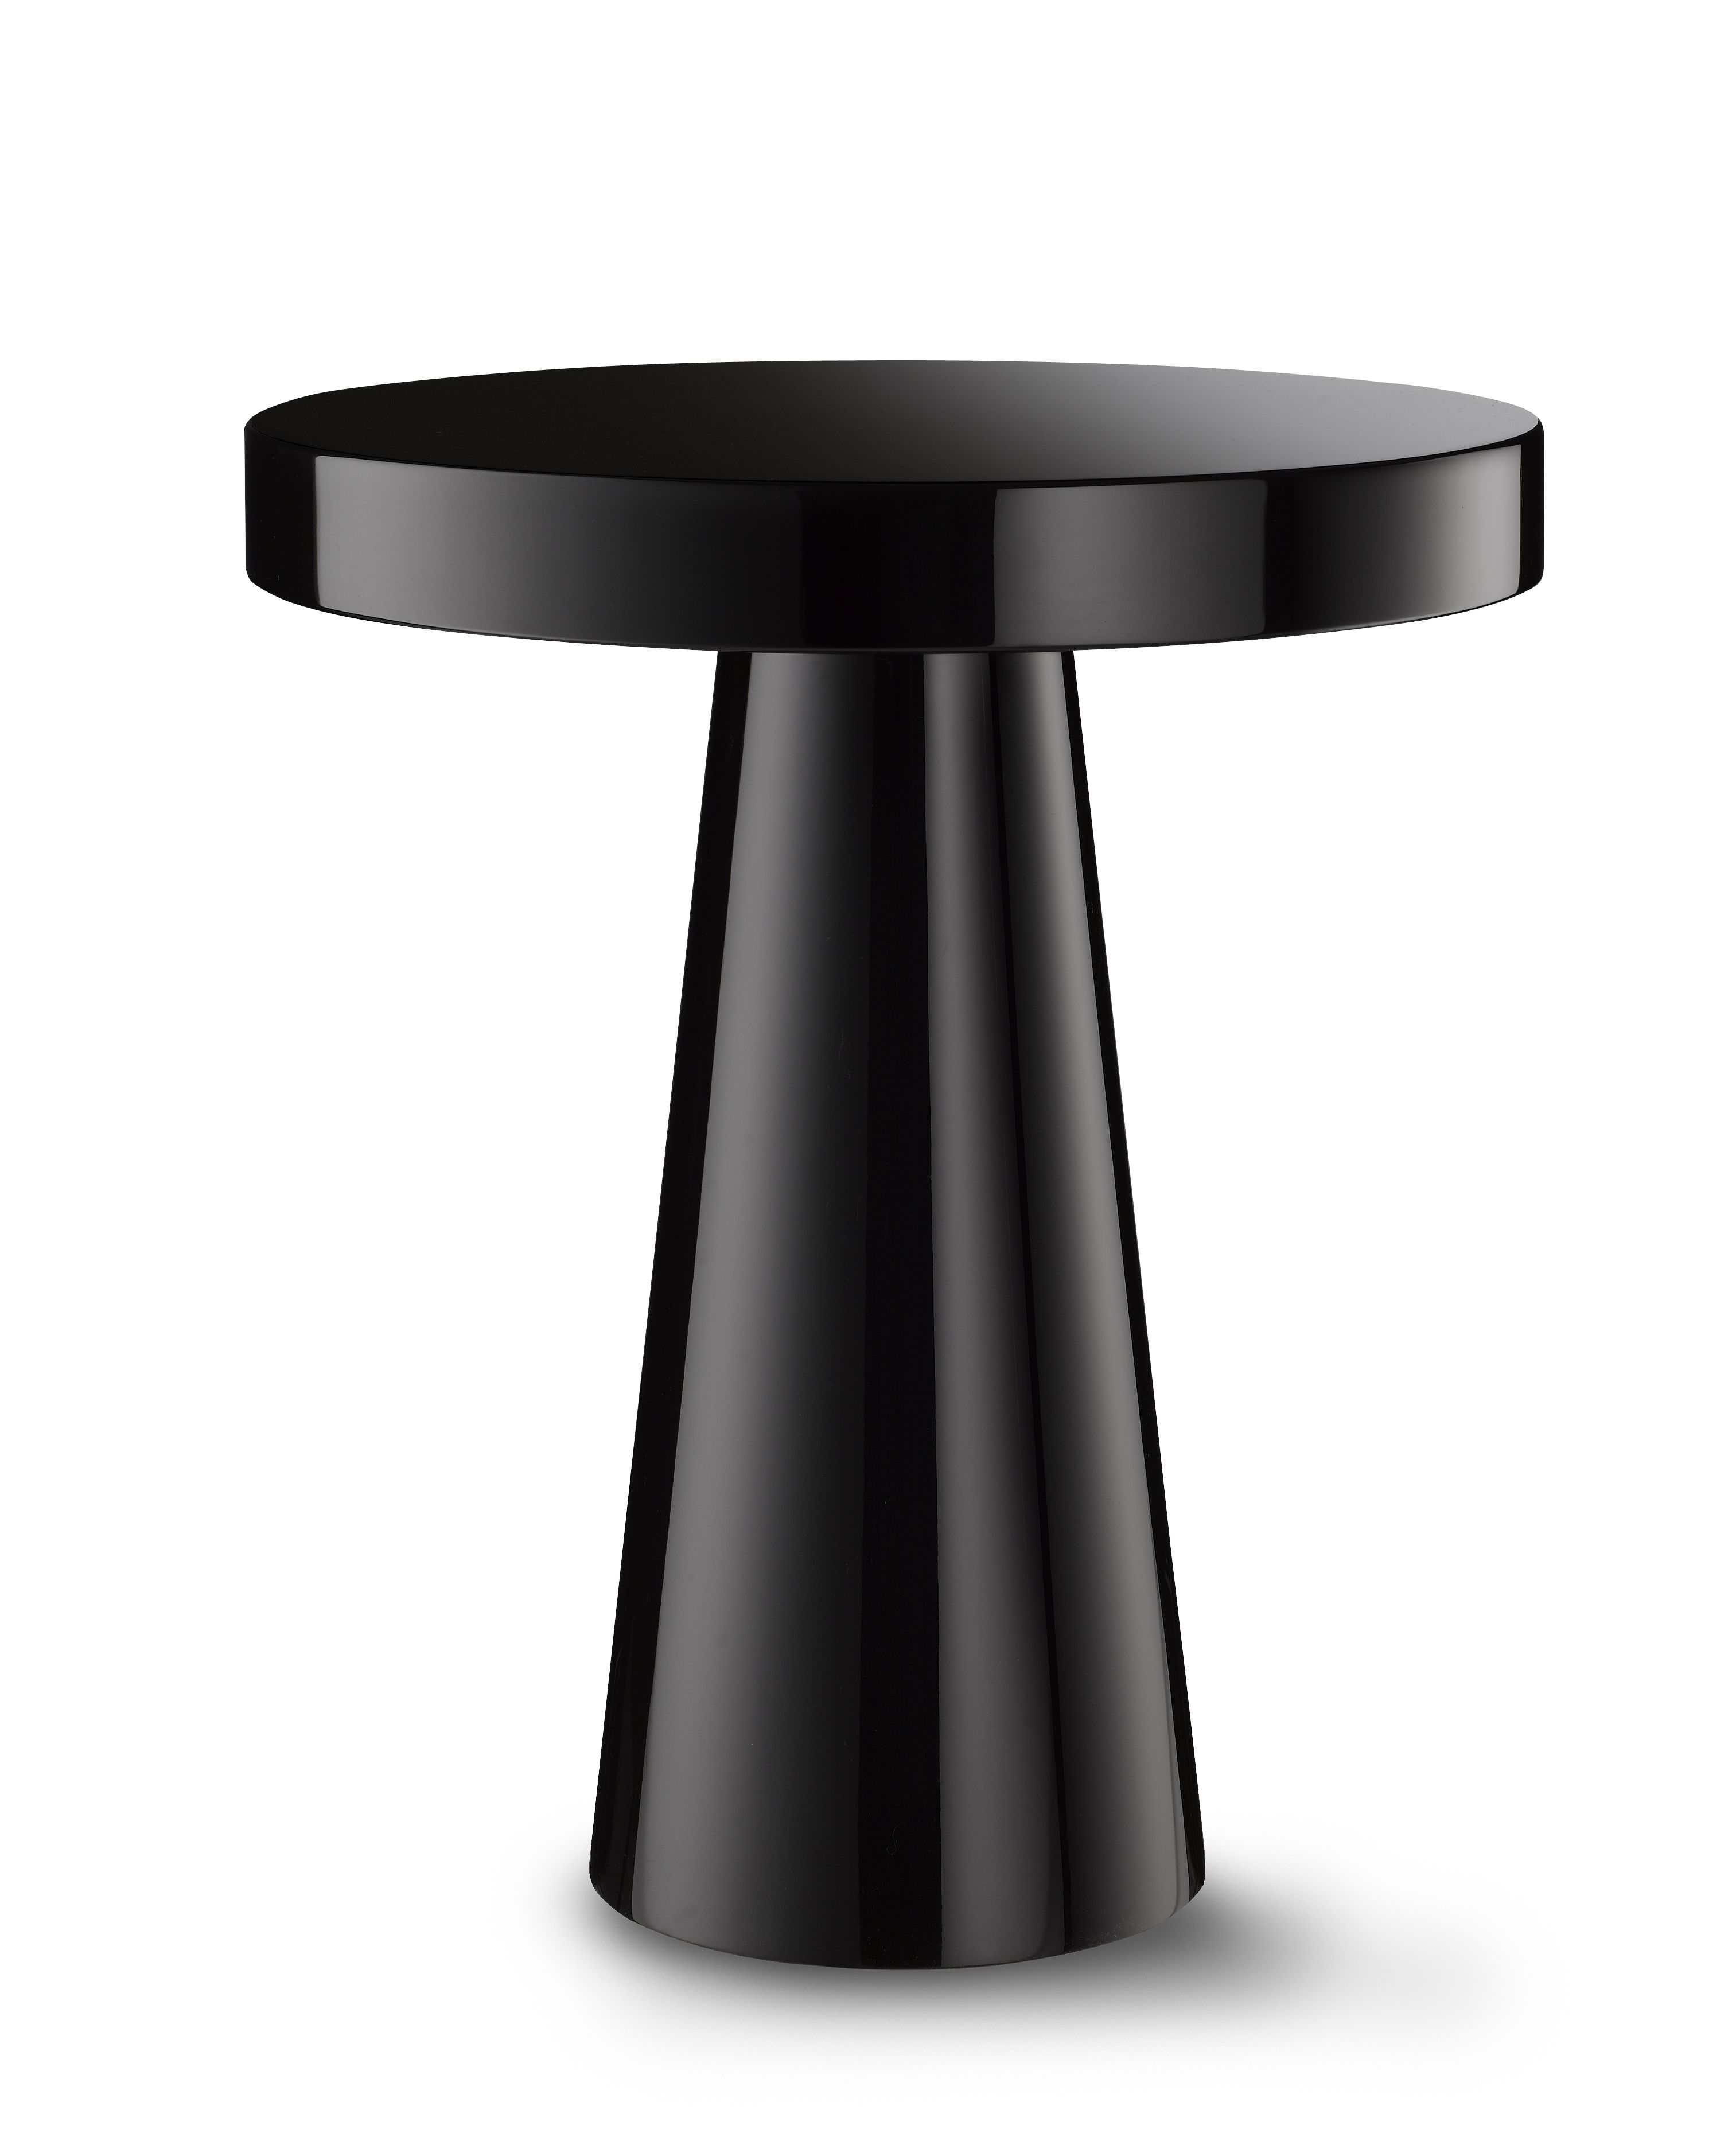 Stupendous Davidson London The Mushroom Table In High Gloss Black Download Free Architecture Designs Crovemadebymaigaardcom